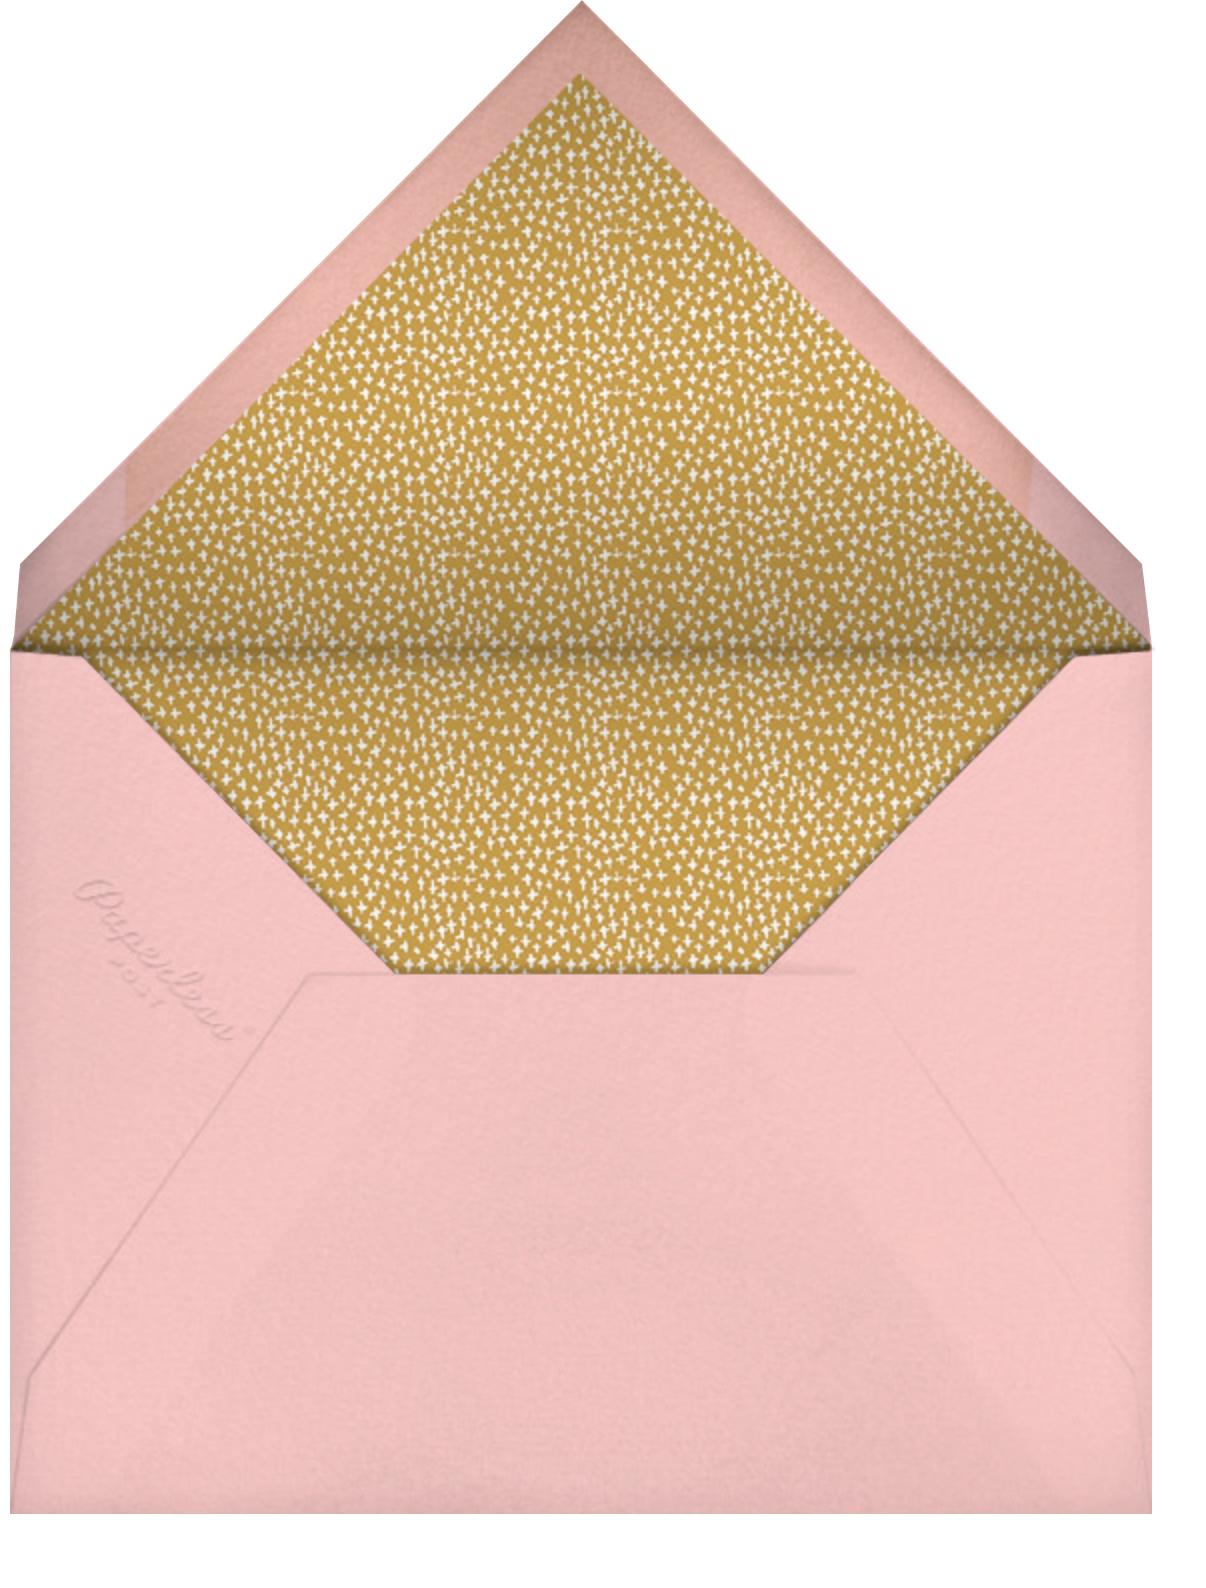 Can't Wait - Mr. Boddington's Studio - Thinking of you - envelope back